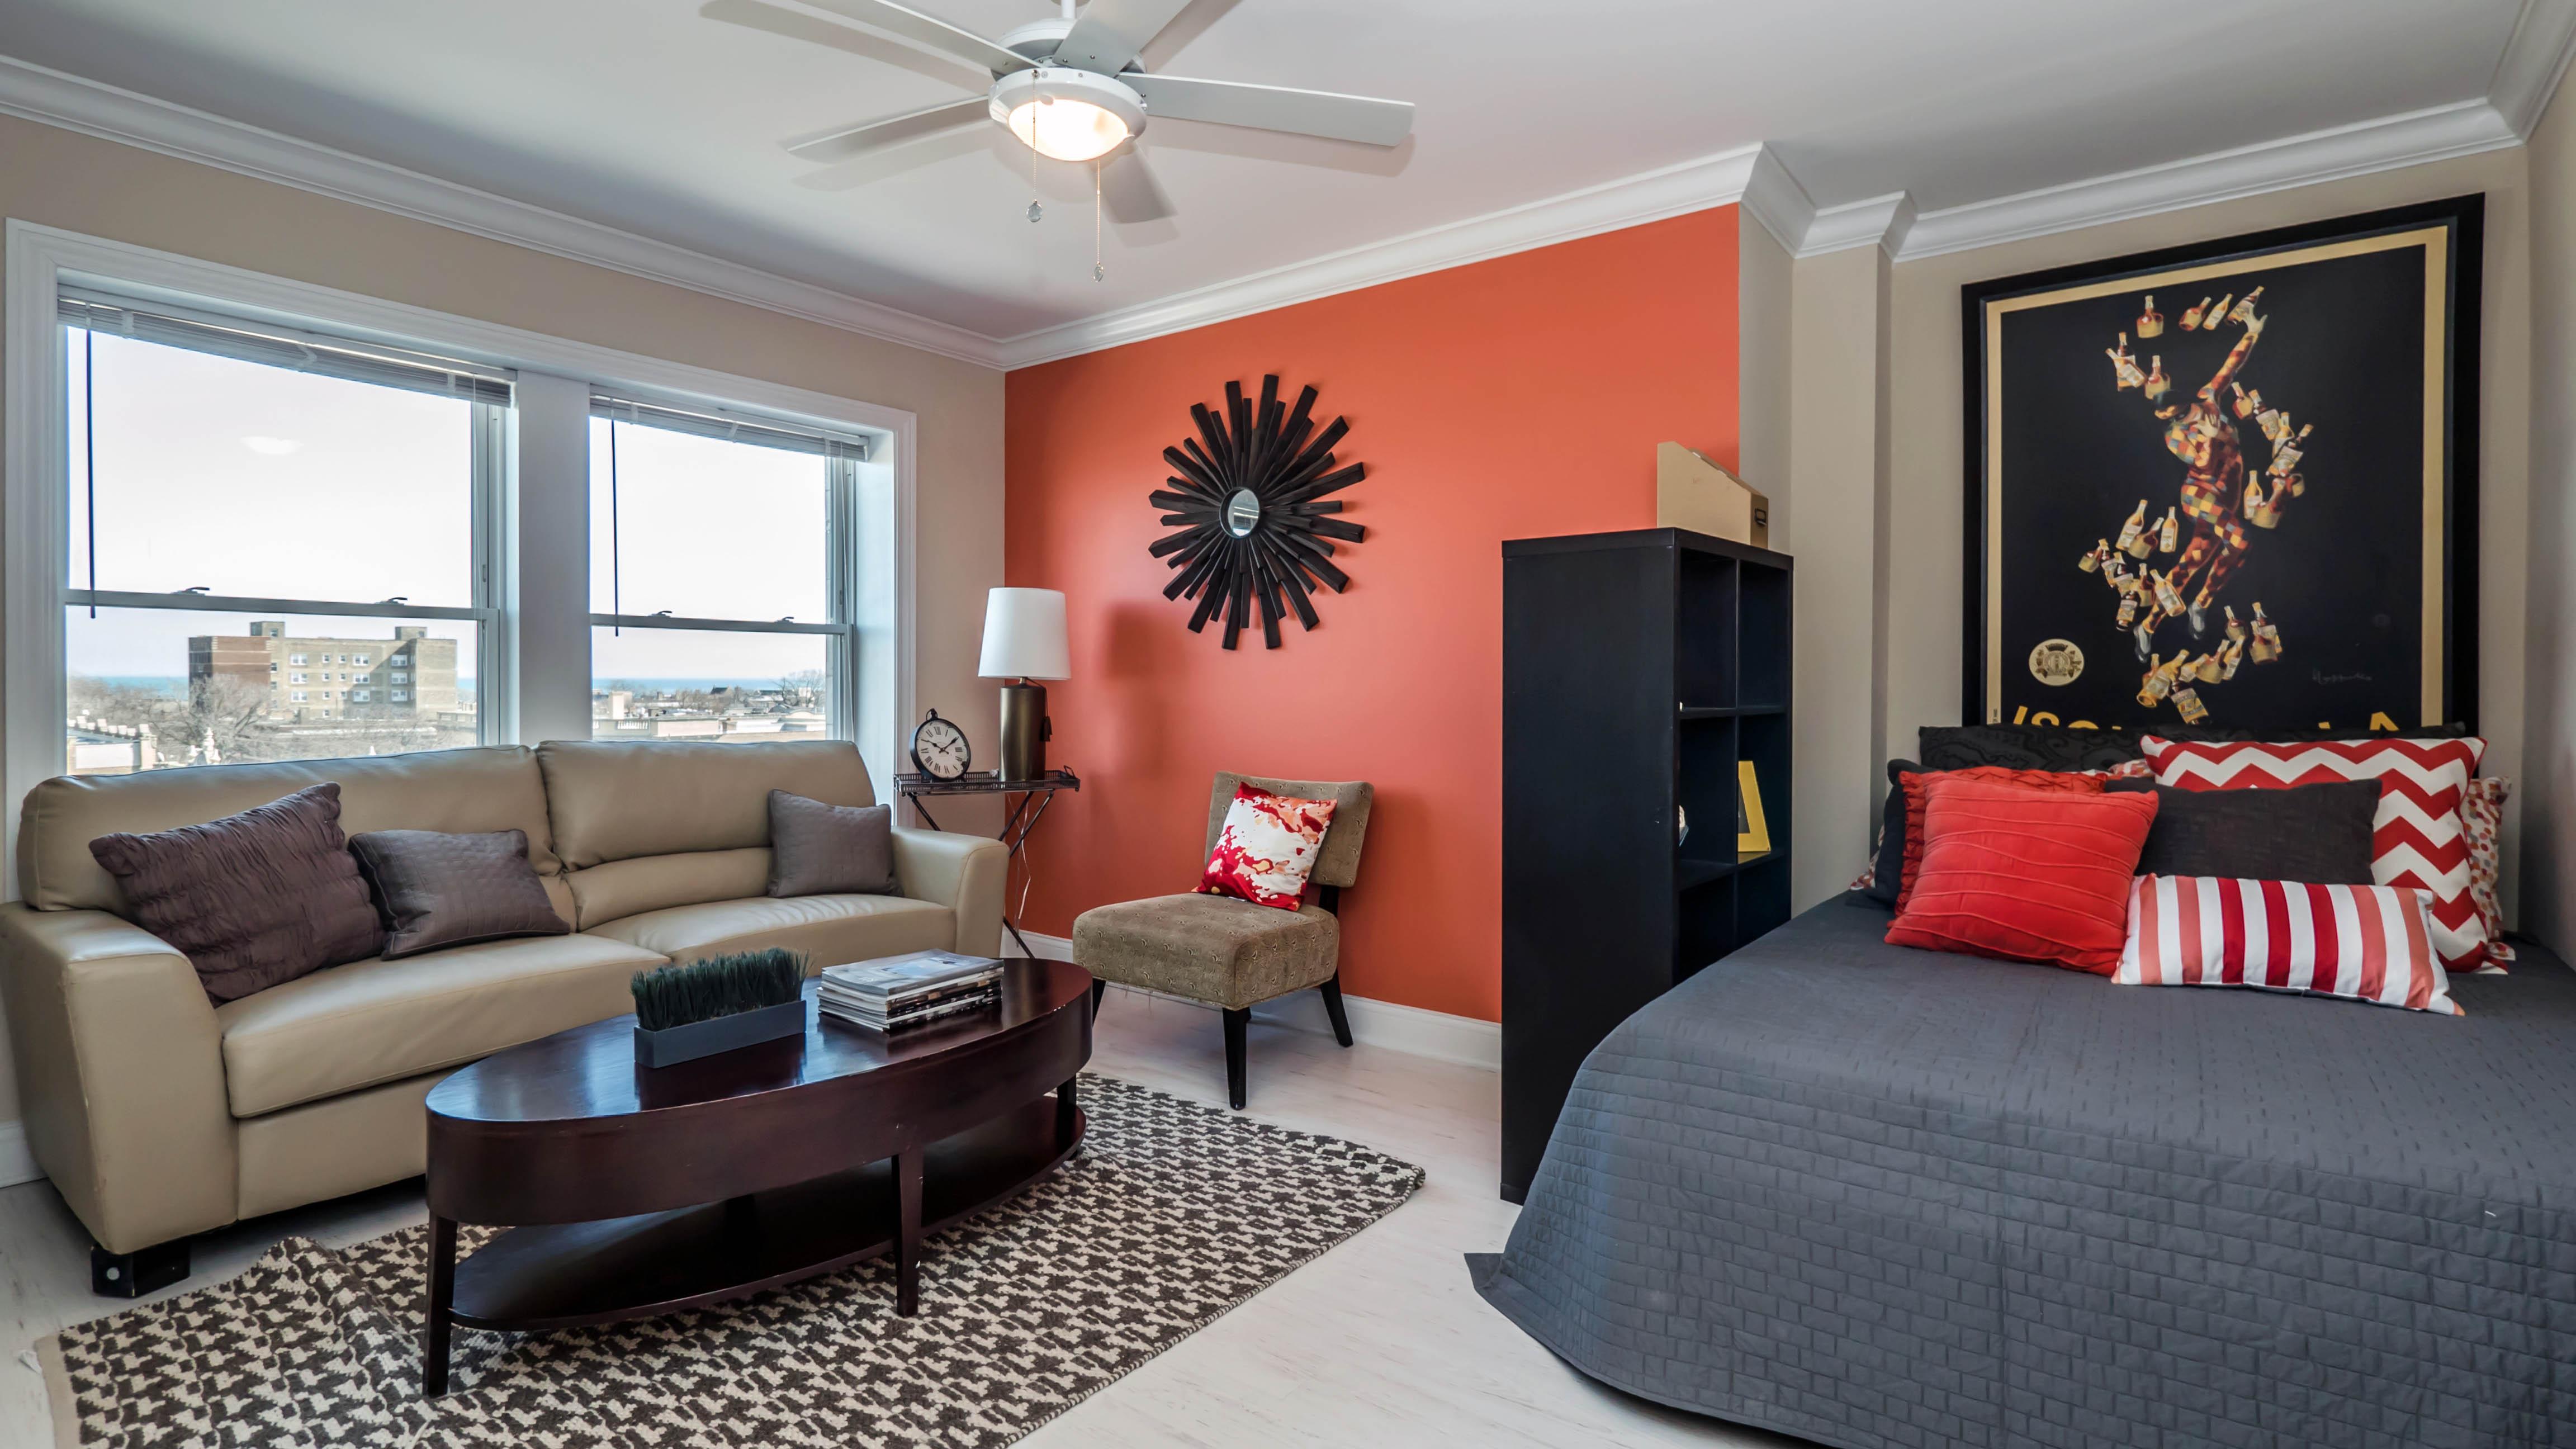 1246 West Pratt apartments Rogers Park YoChicago